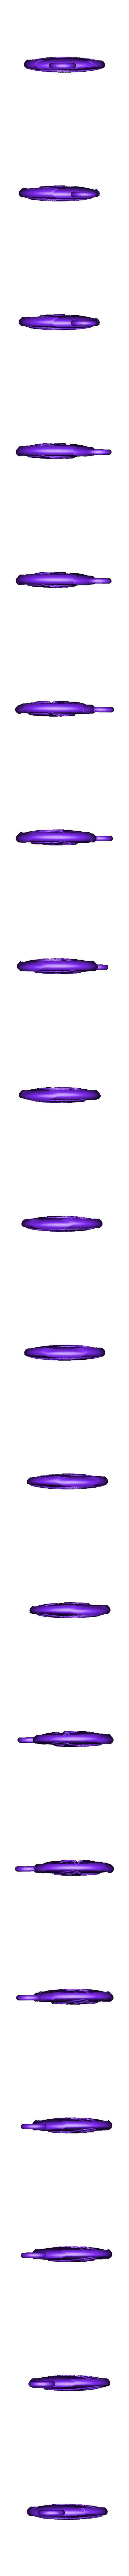 crop circle1.stl Download free STL file Crop circle medallion • 3D printable model, swivaller